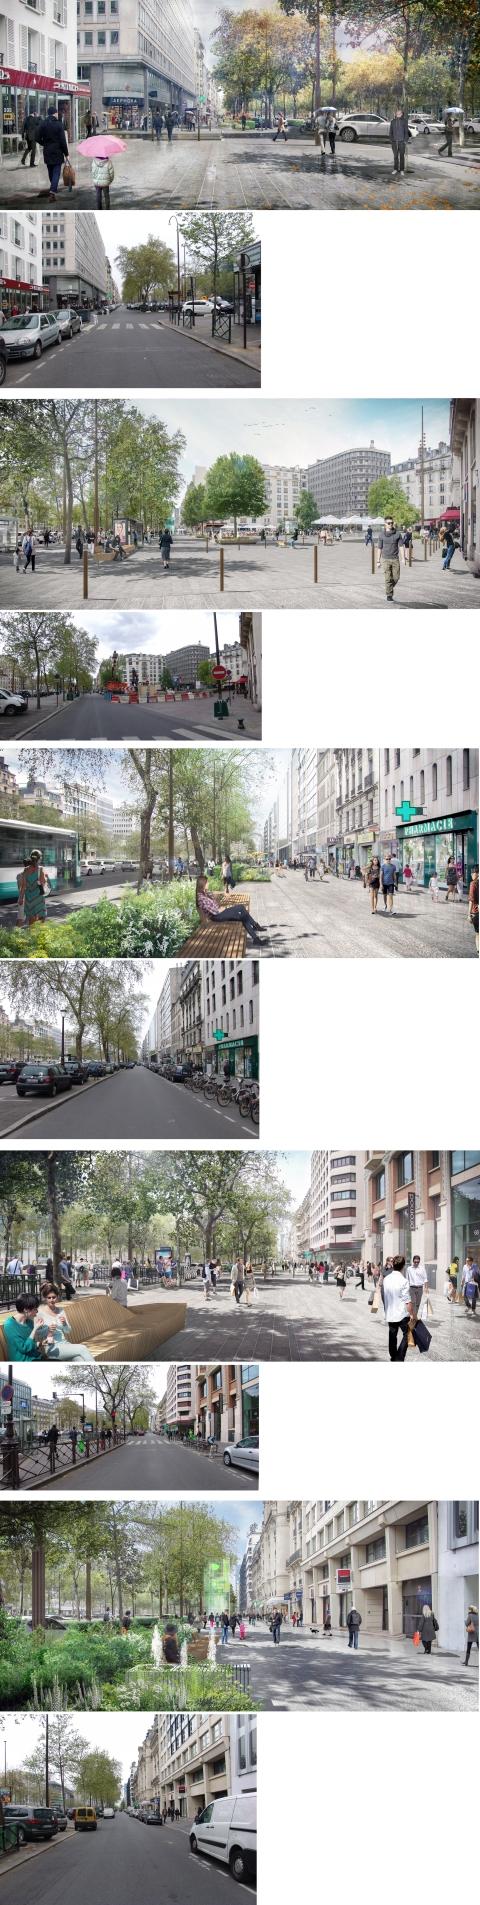 138-Neuilly.jpg